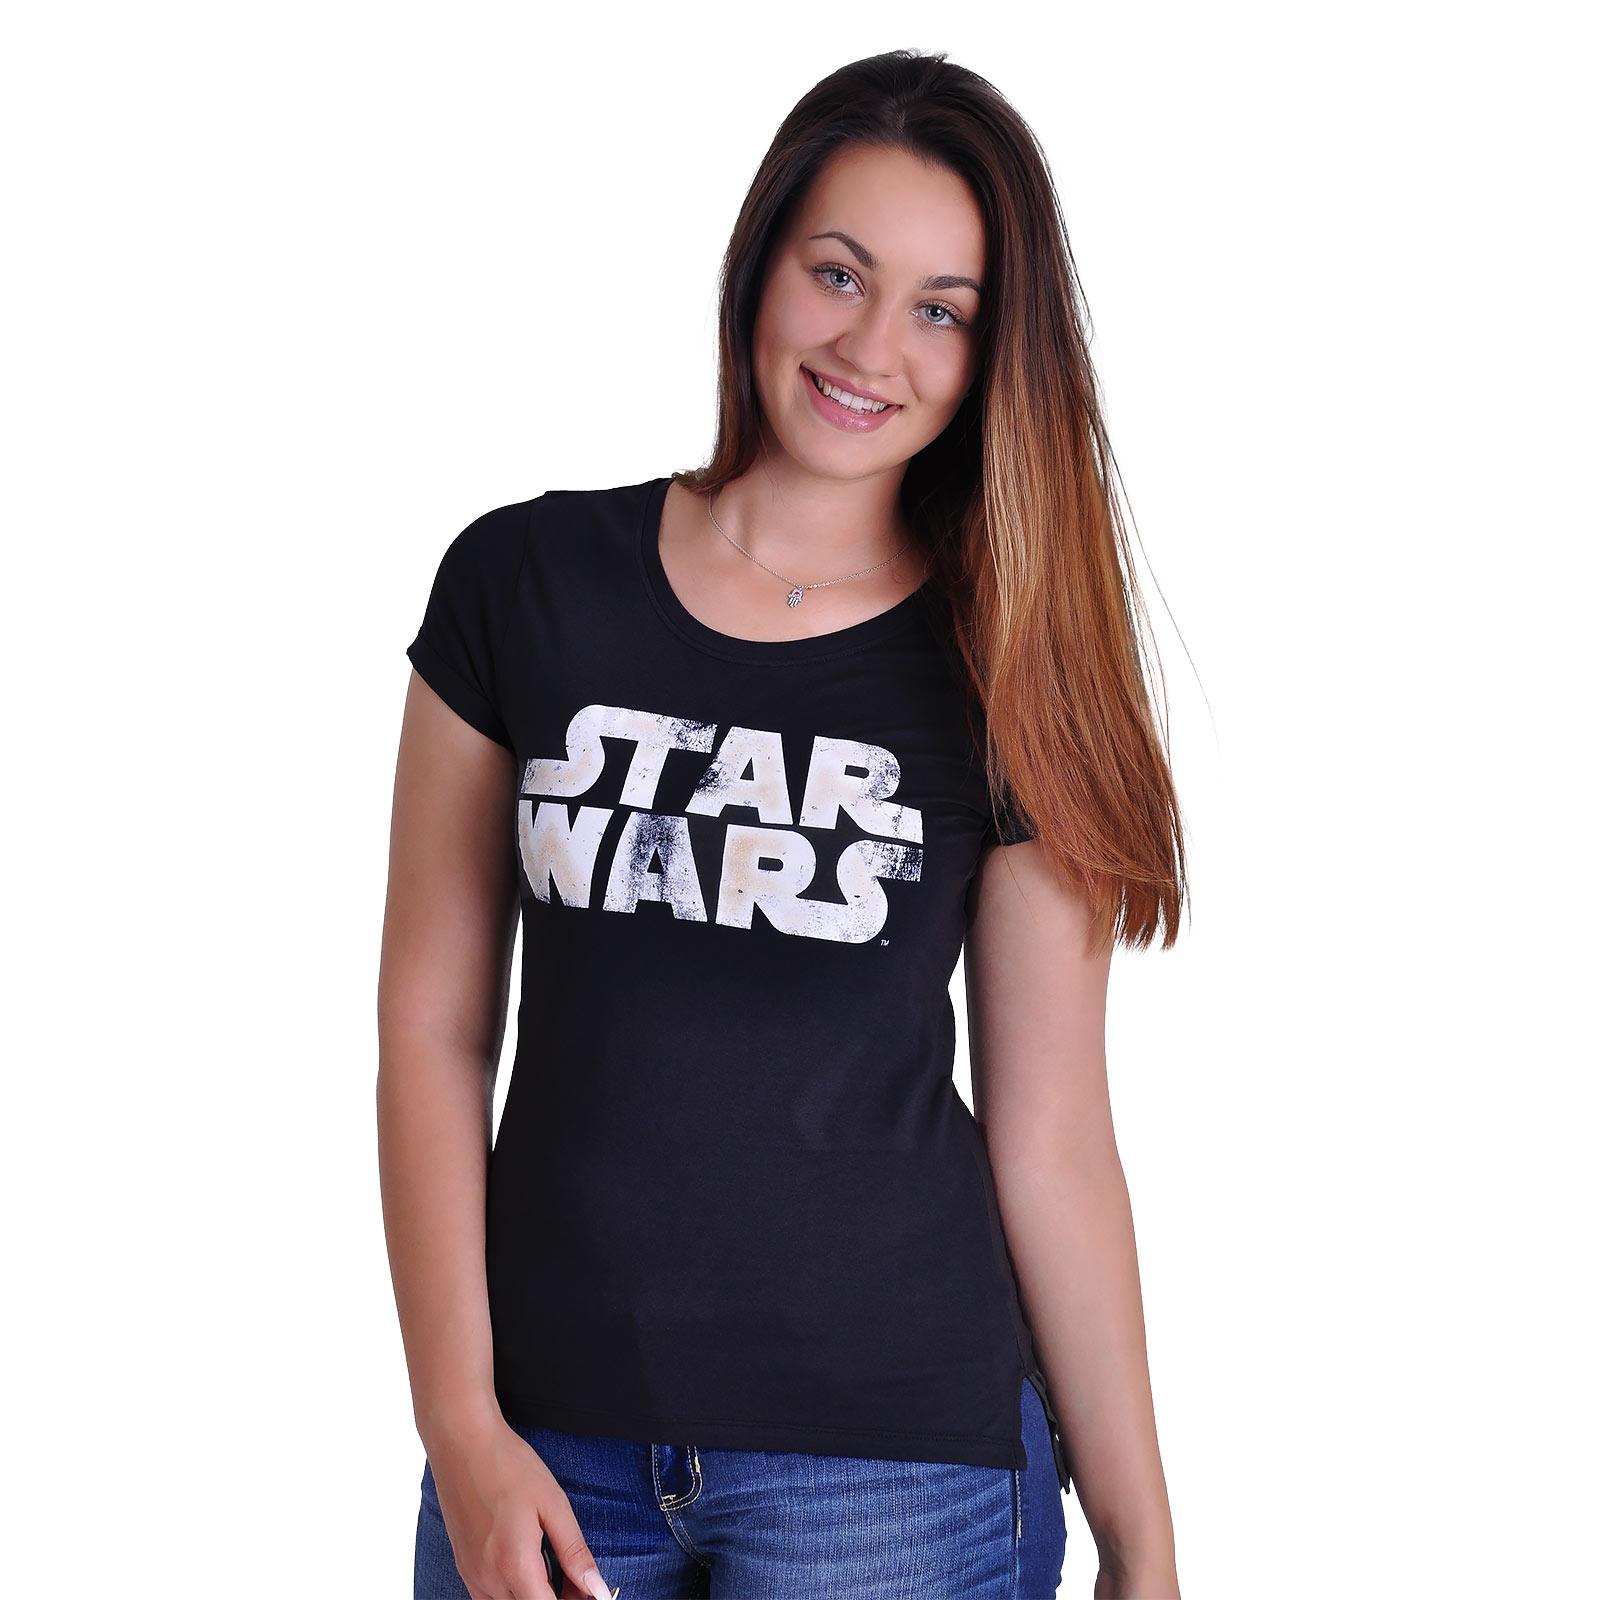 Star Wars - Distressed Logo Girlie Shirt schwarz